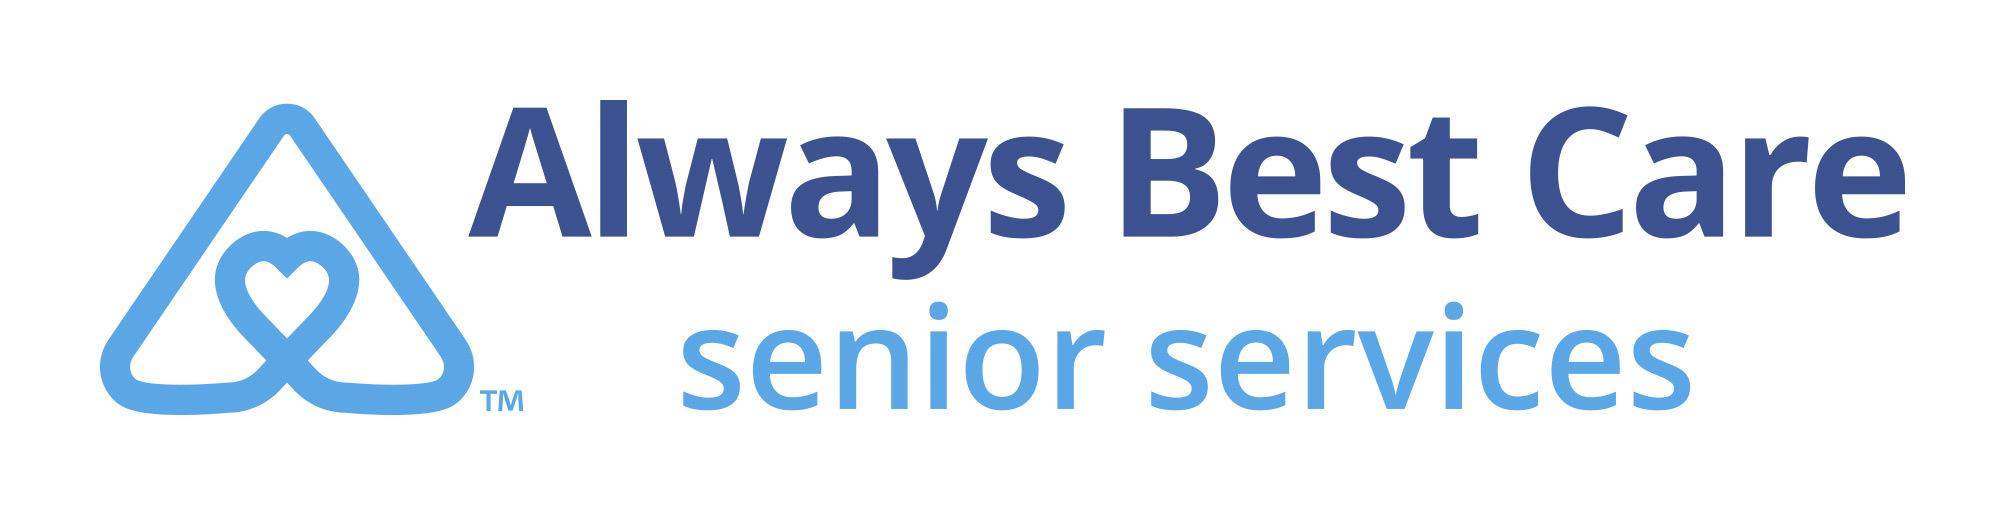 Always best care logo fb 2021